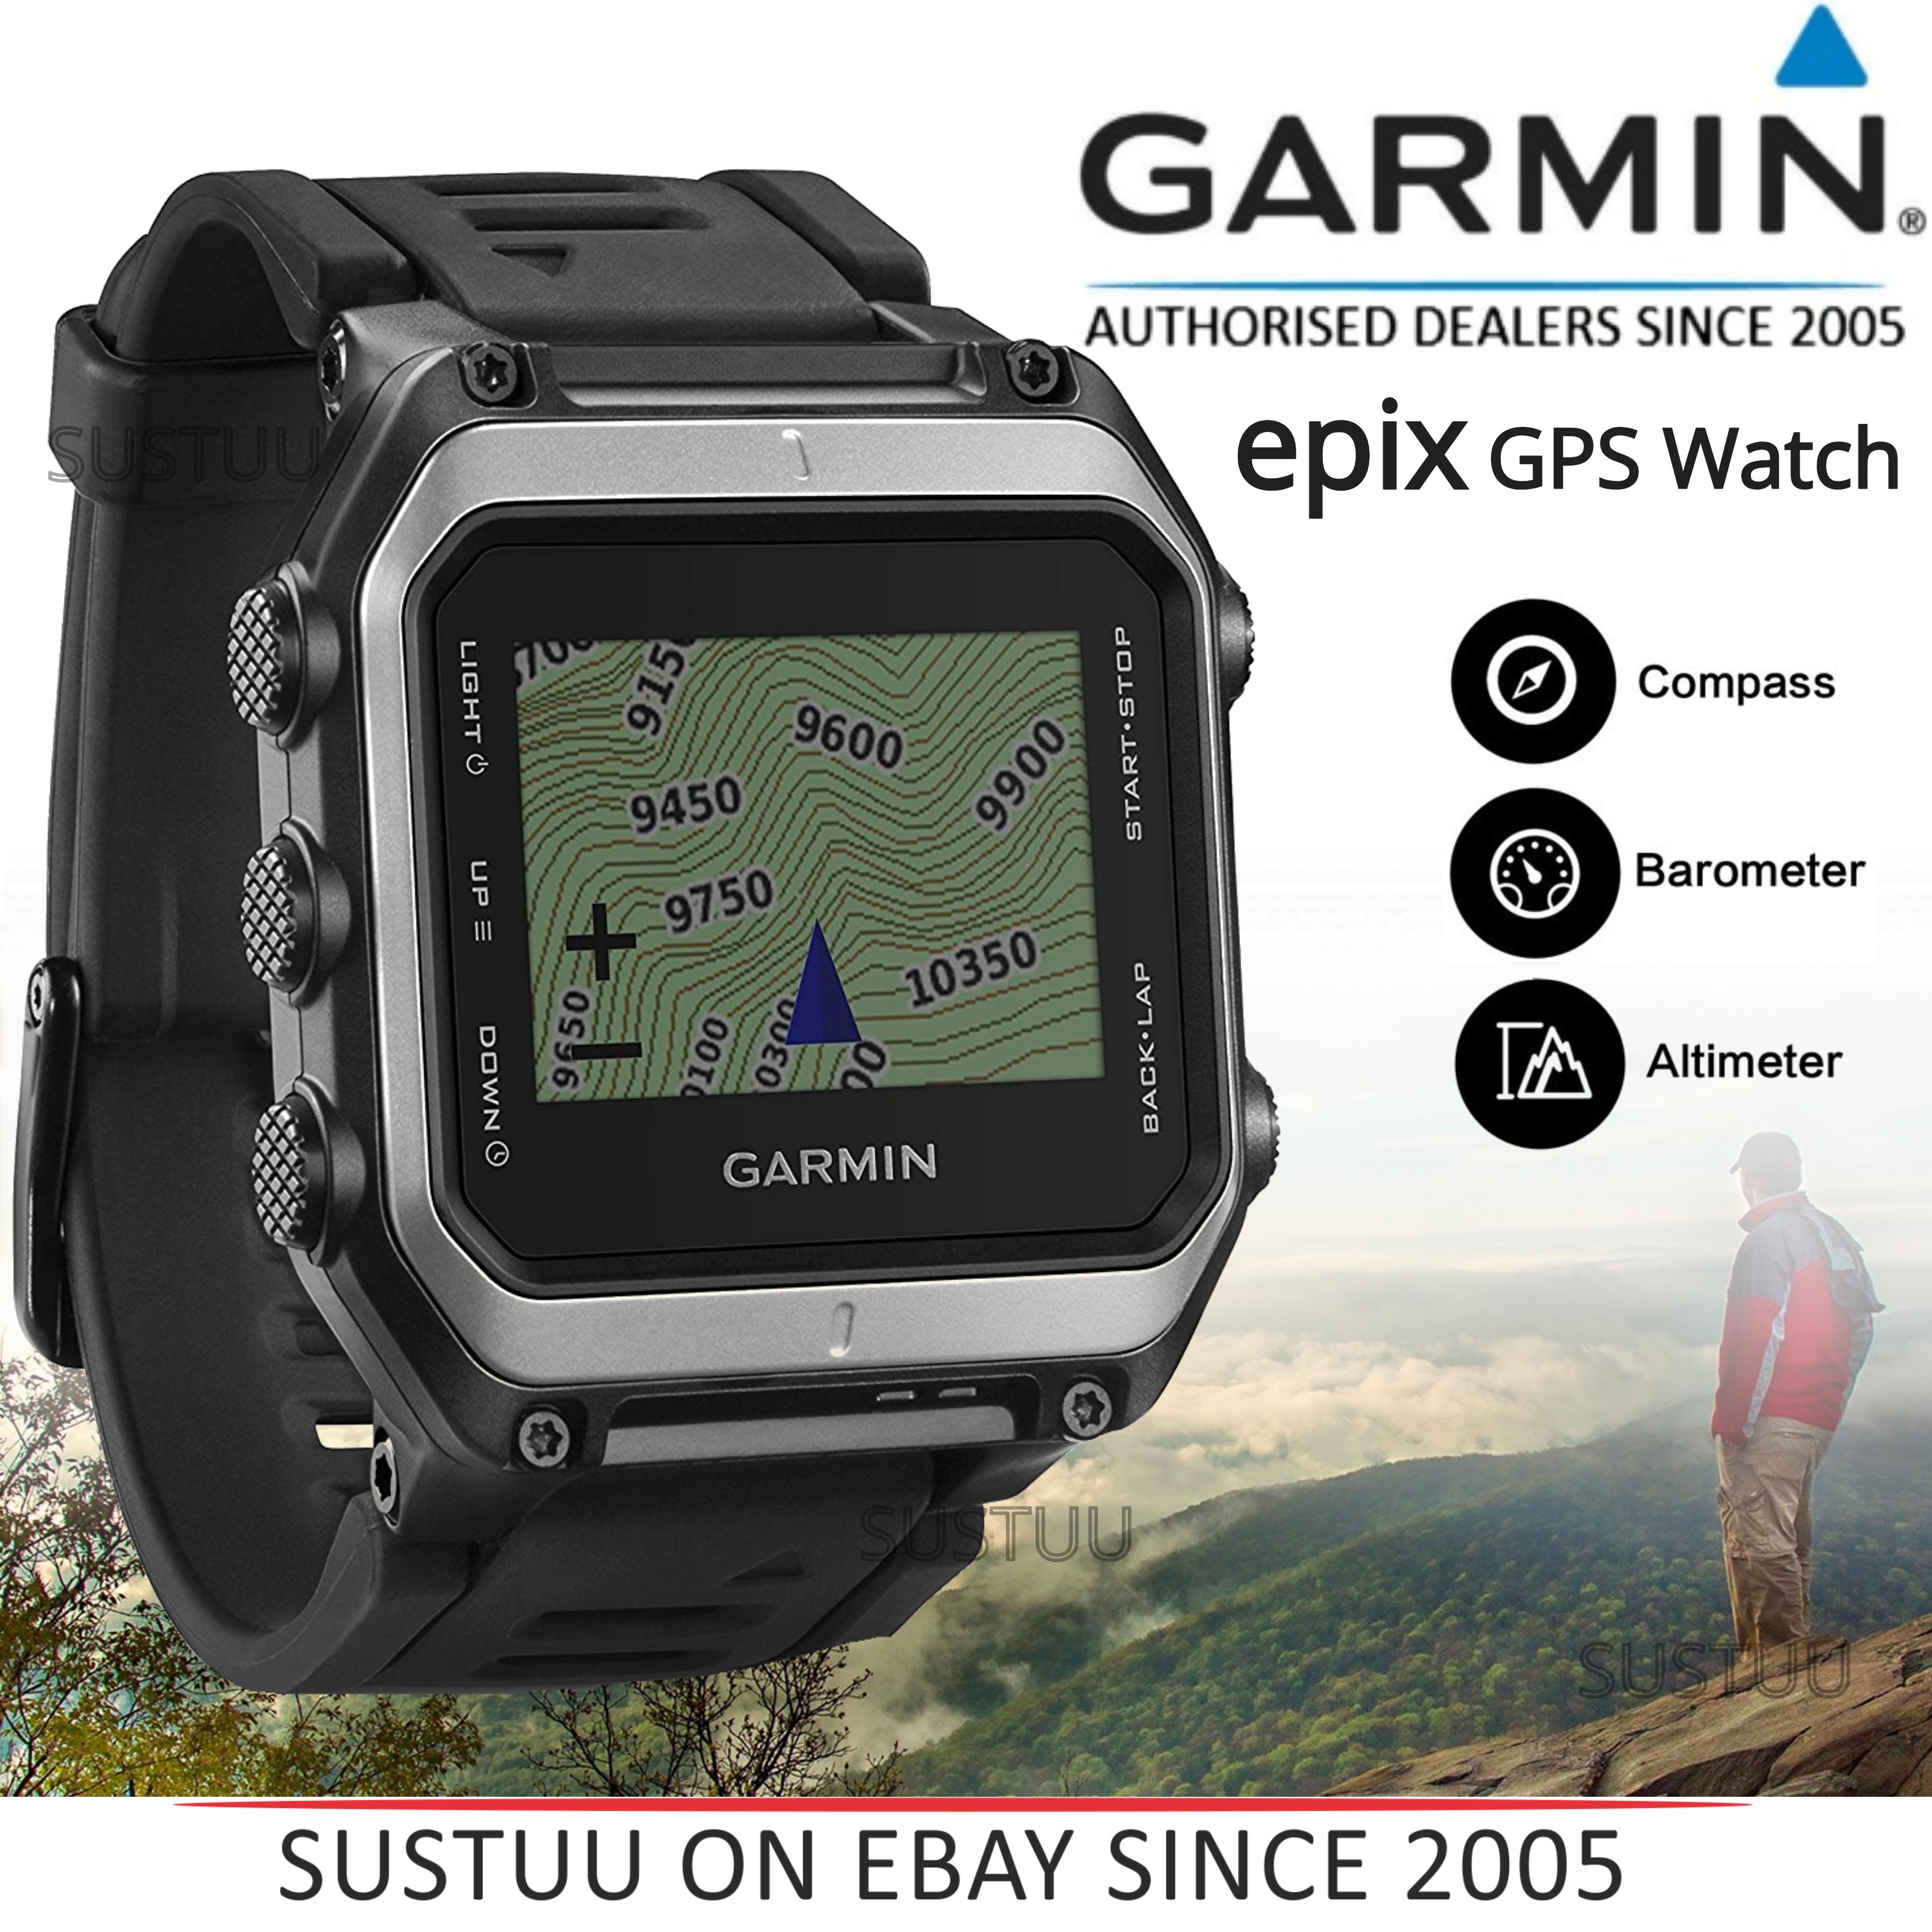 Garmin Epix GPS Outdoor Altimeter Barometer Smart ABC Watch